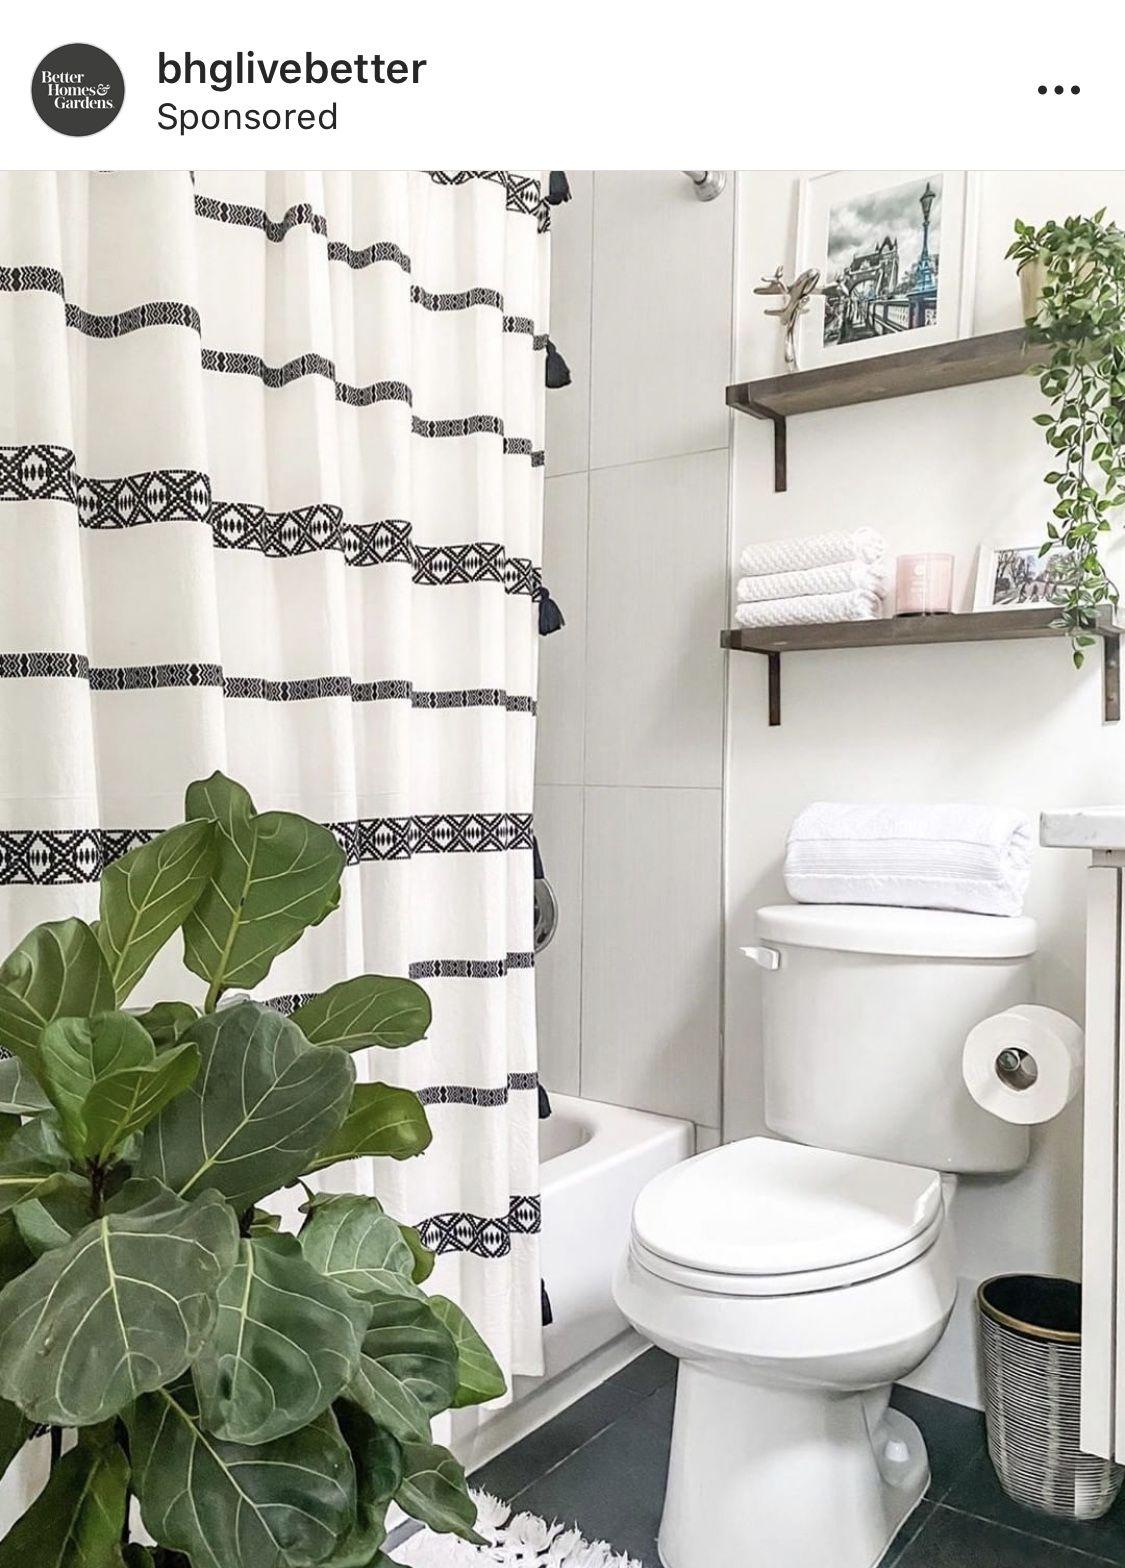 Better Homes Gardens Boho Chic Cotton Shower Curtain Beige Black 72 X72 Walmart Com Simple Bathroom Decor Diy Bathroom Makeover Bathroom Renovation Diy [ 1568 x 1125 Pixel ]